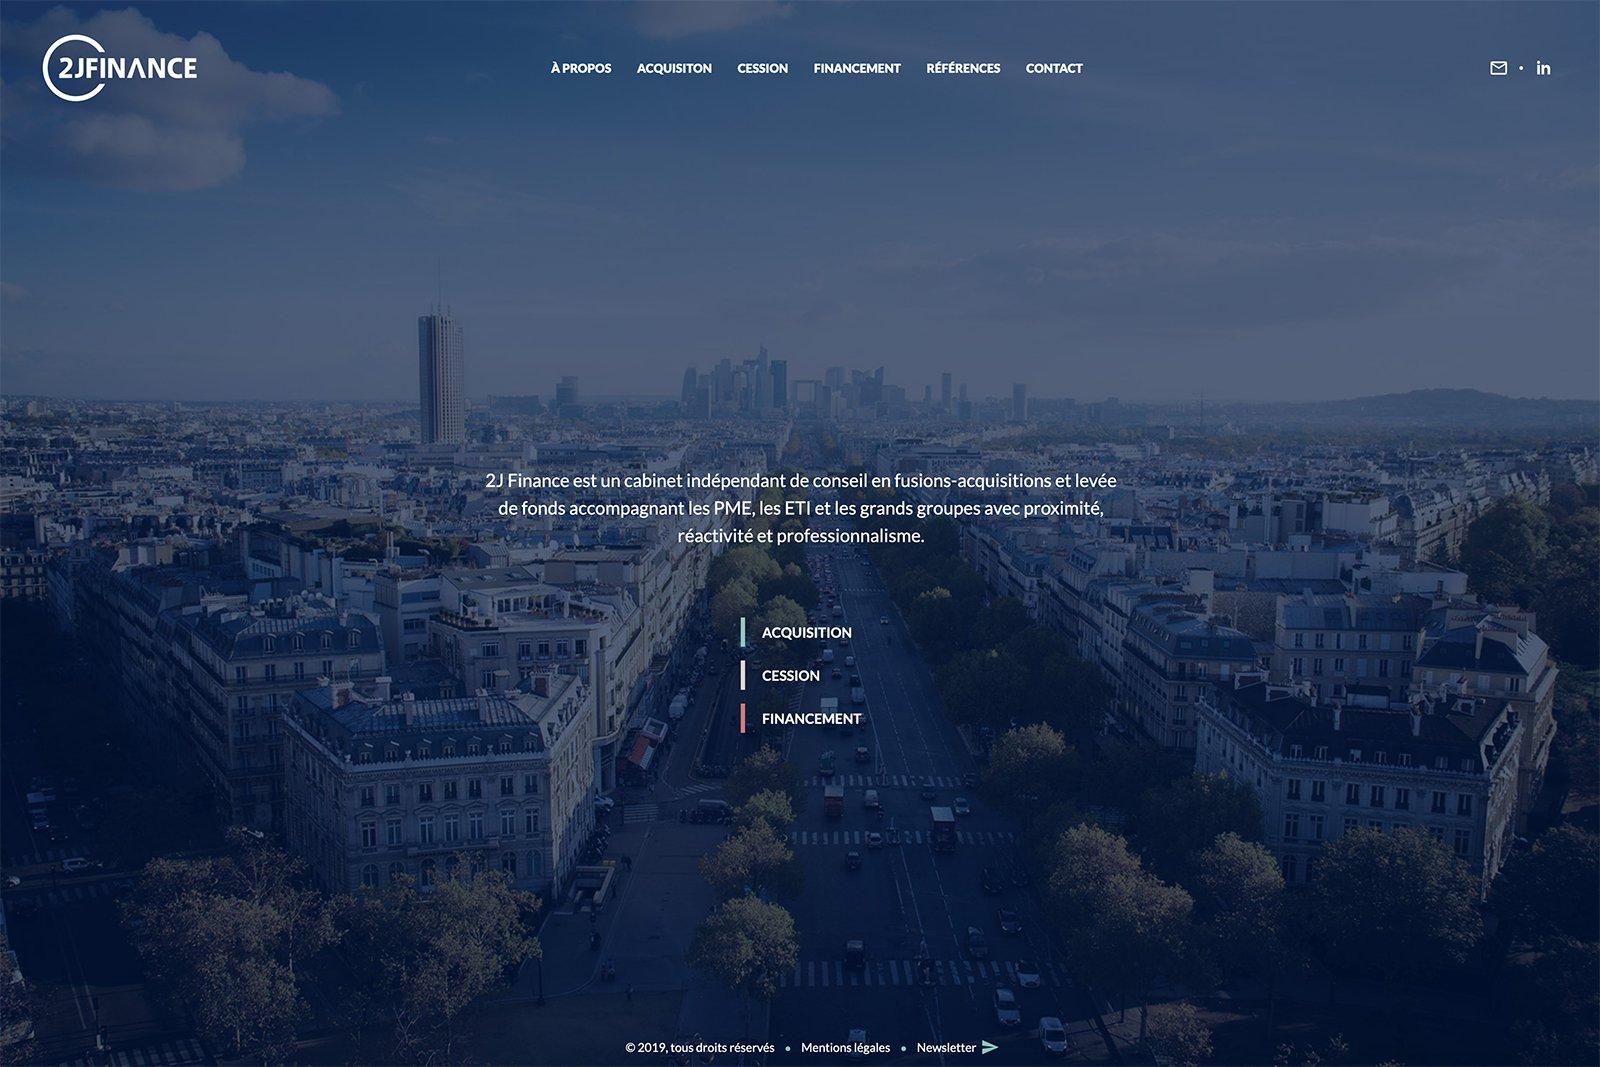 Capture du site internet 2J Finance